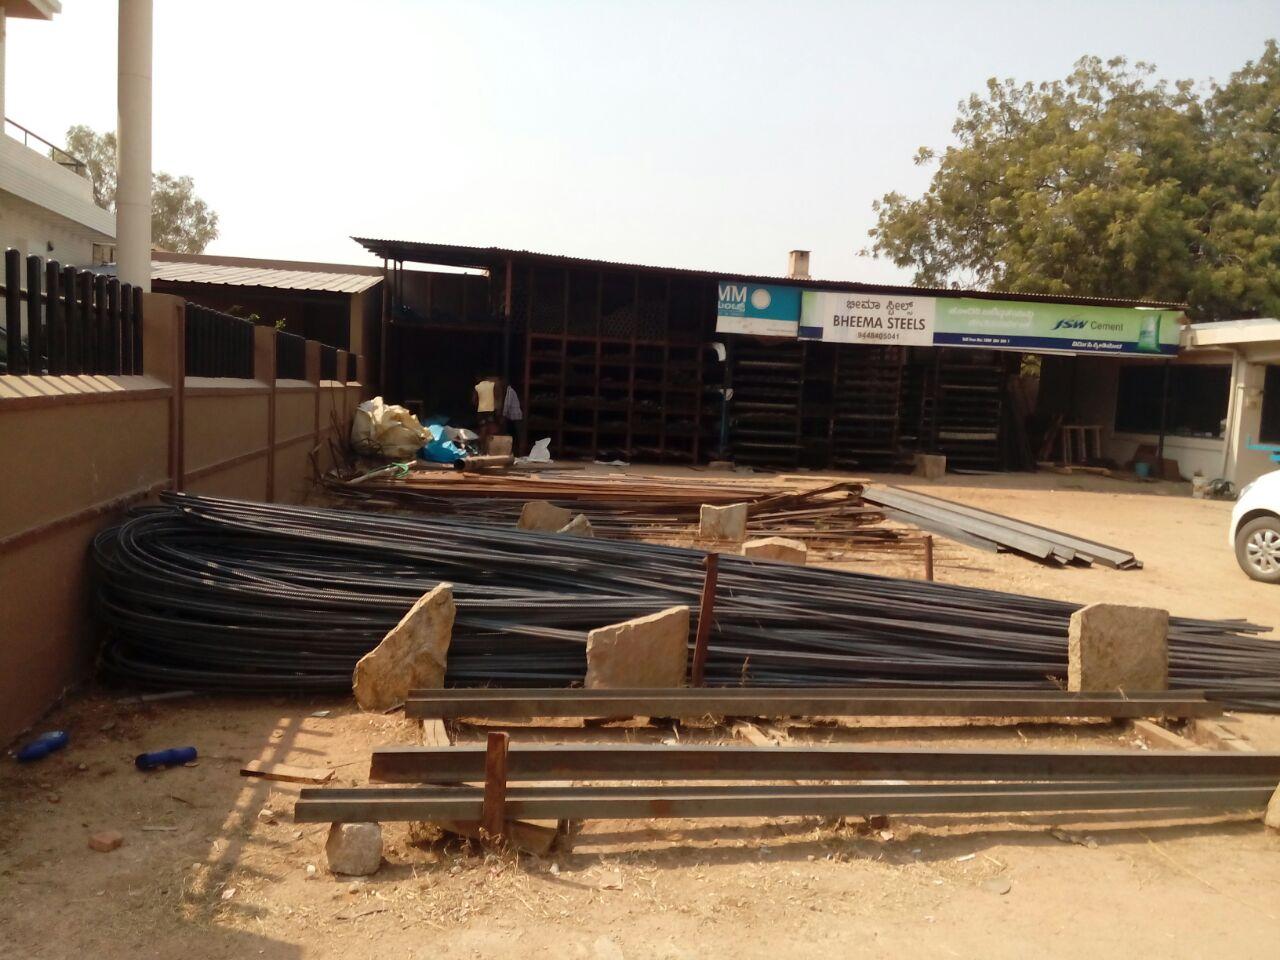 Bheema Steels